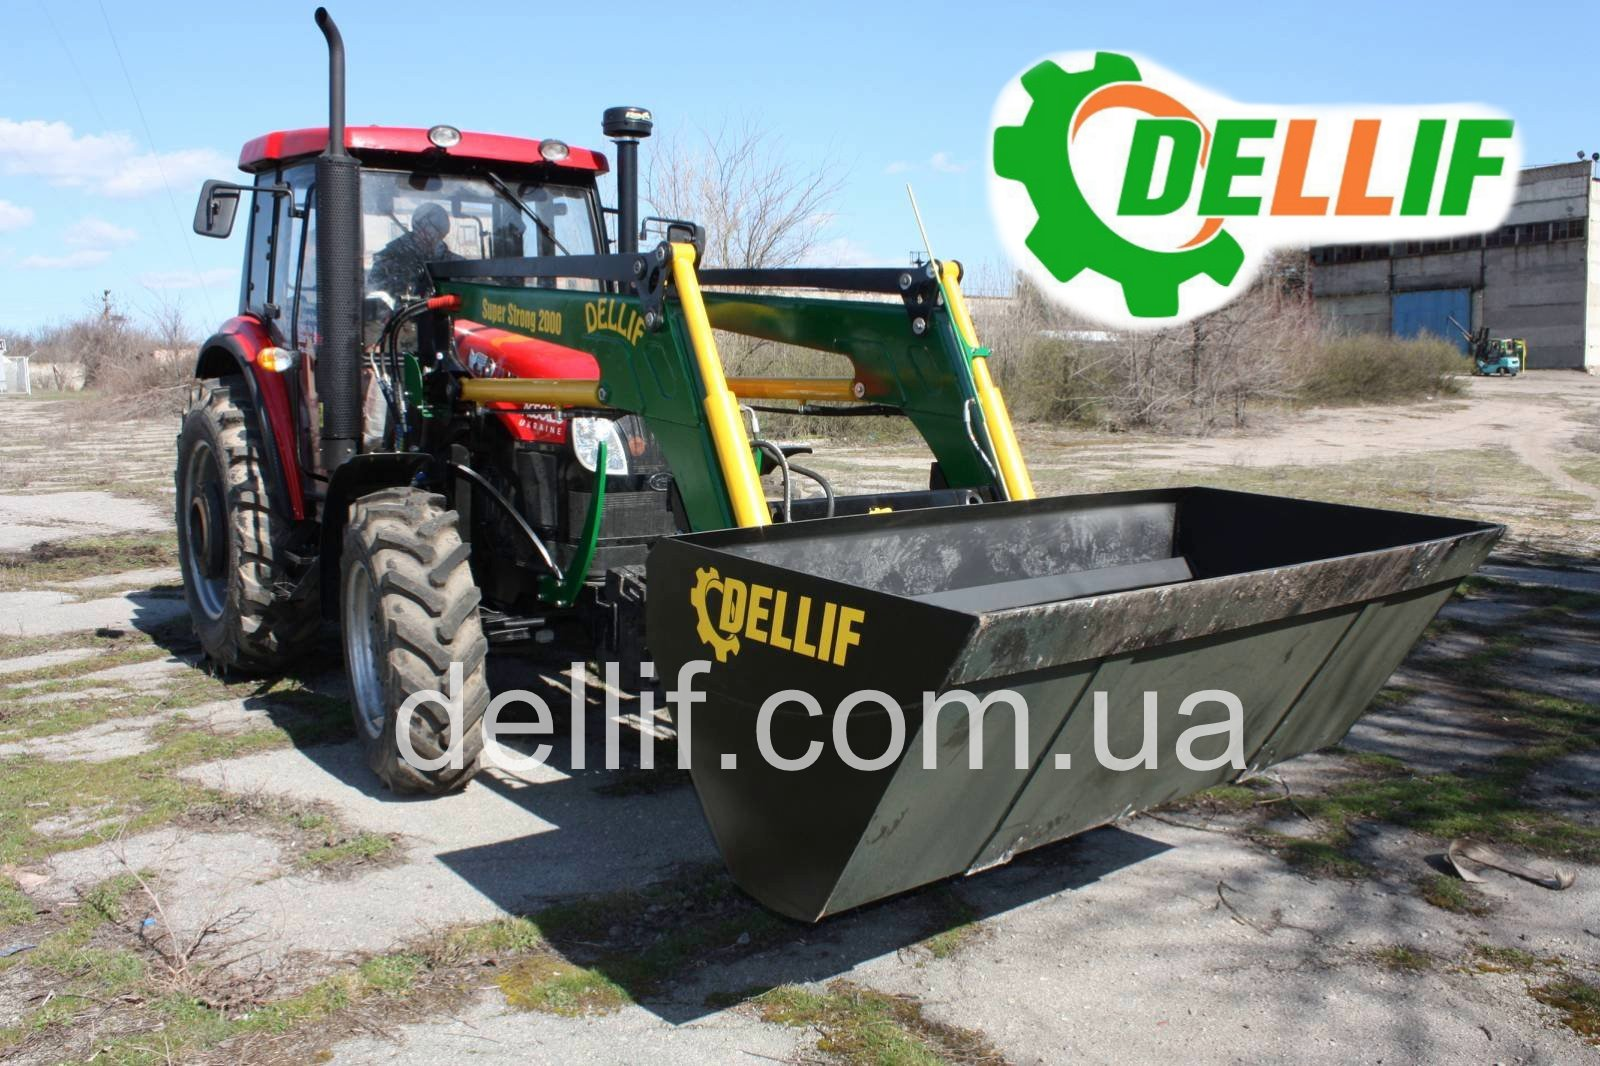 Кун на трактор Yto 954 (юто) - Деллиф Супер Стронг 2000